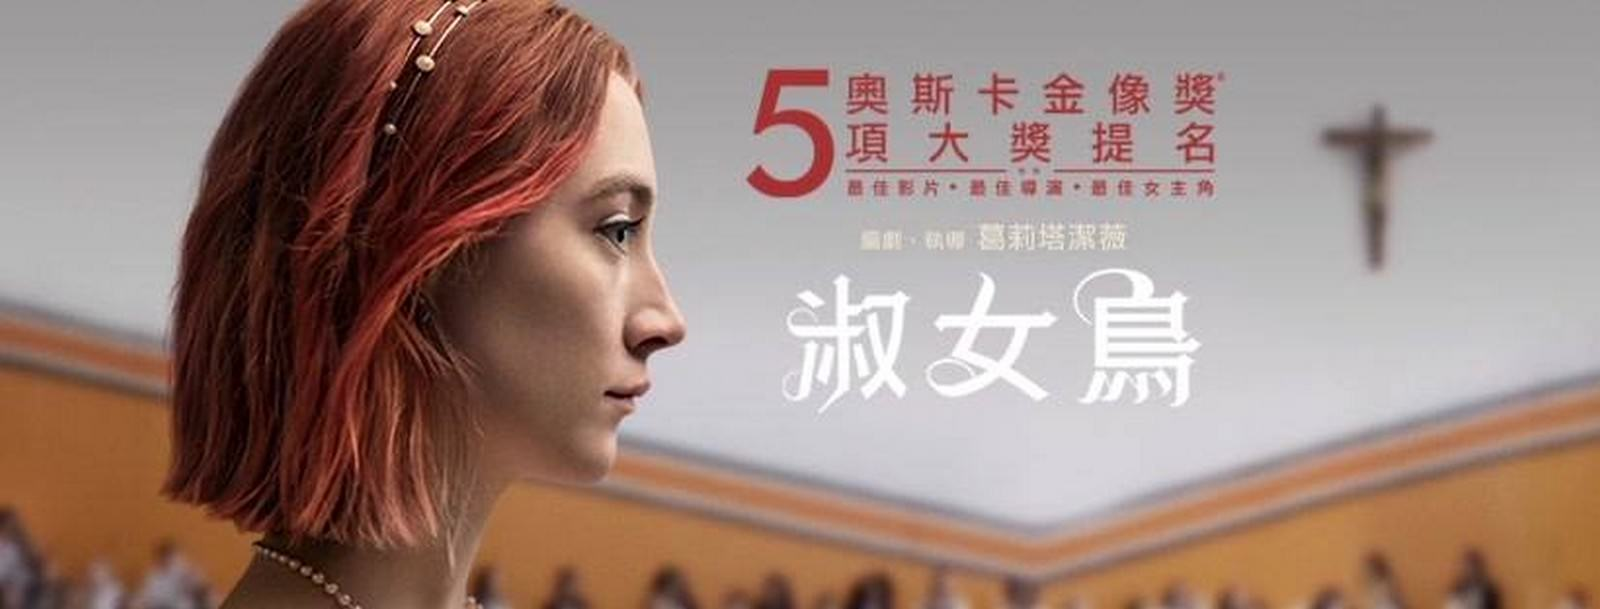 Movie, Lady Bird(美國) / 淑女鳥(台) / 不得鳥小姐(港) / 伯德小姐(網), 電影海報, 台灣, 橫板